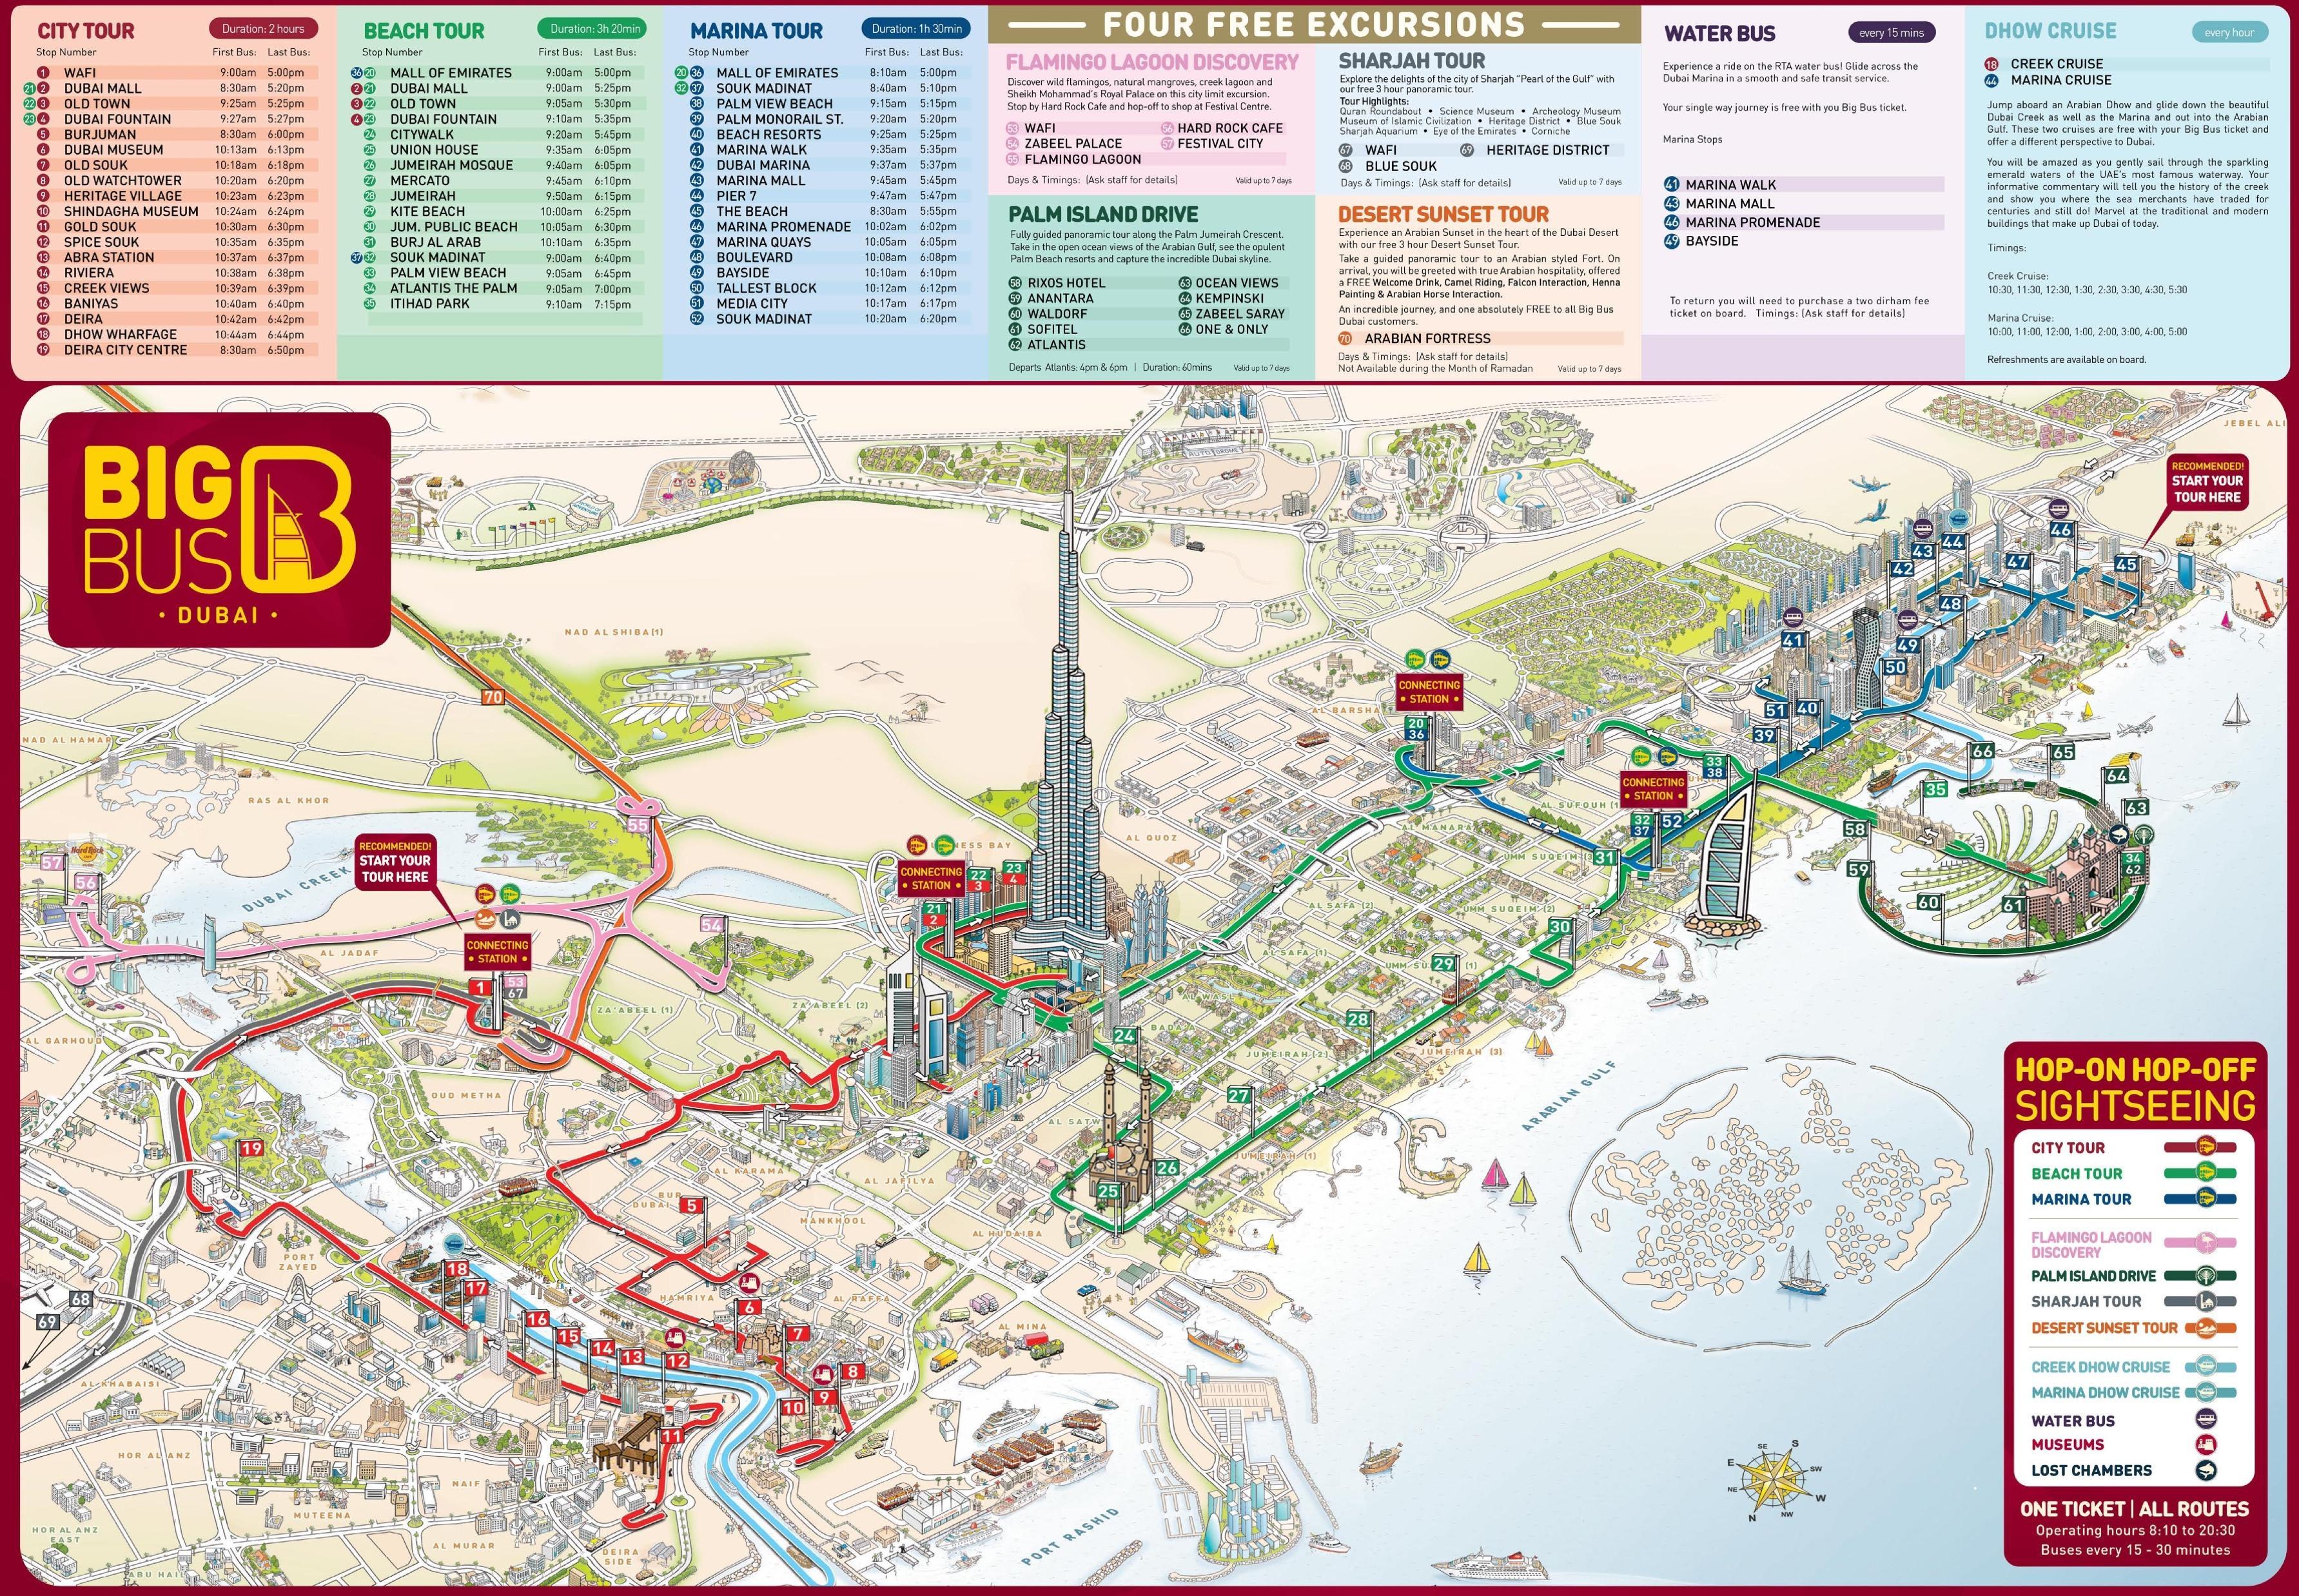 duba attractions de la carte carte des attractions de duba emirats arabes unis. Black Bedroom Furniture Sets. Home Design Ideas